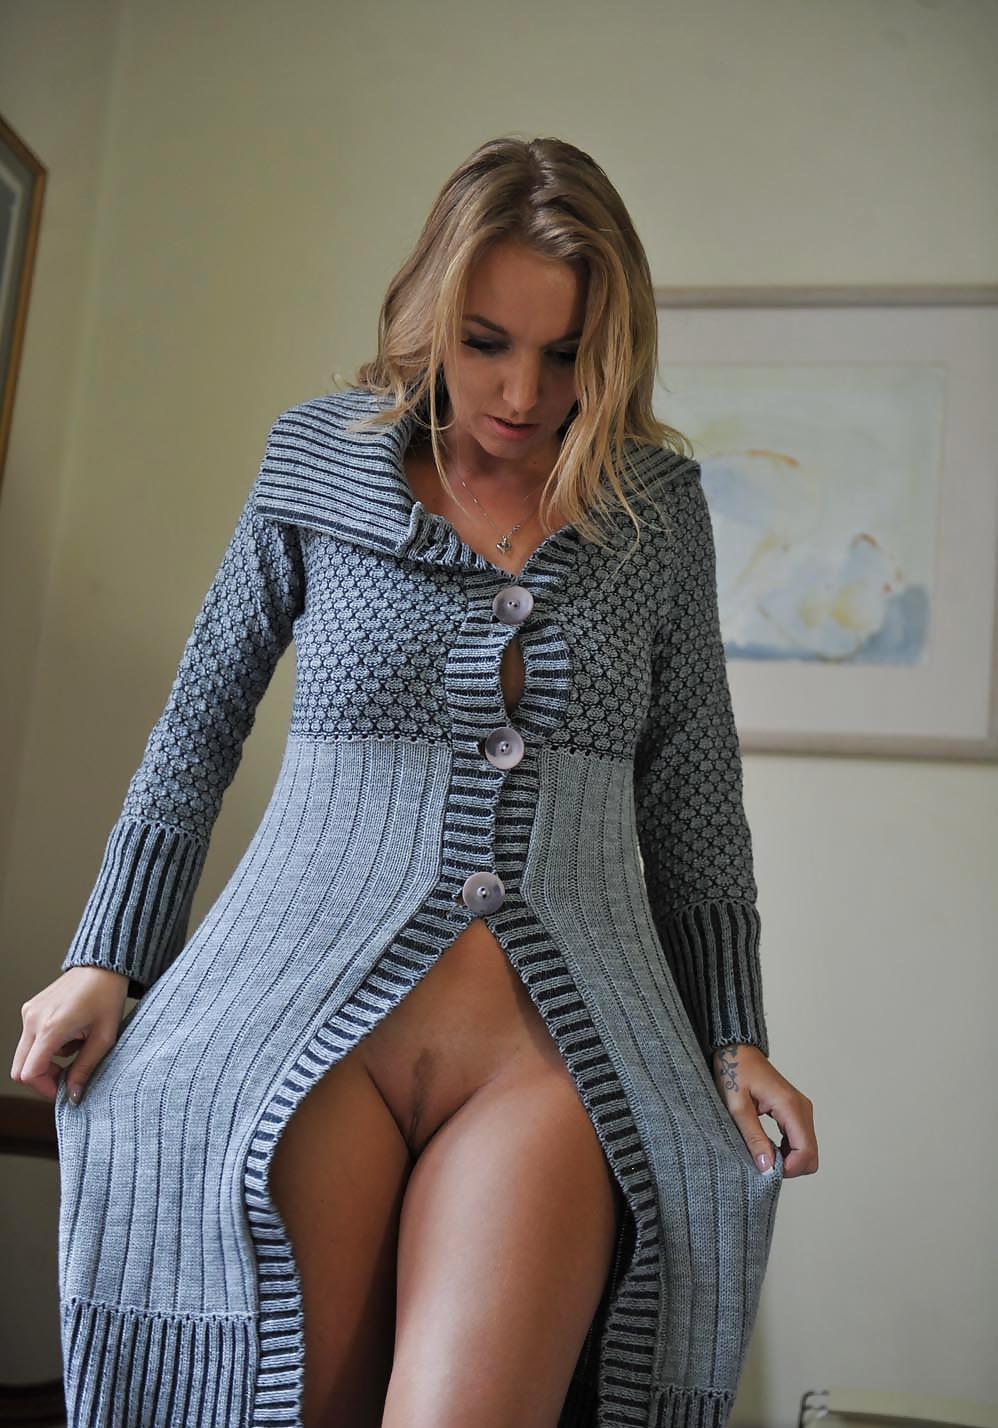 femme matures du 32 en photos sexes